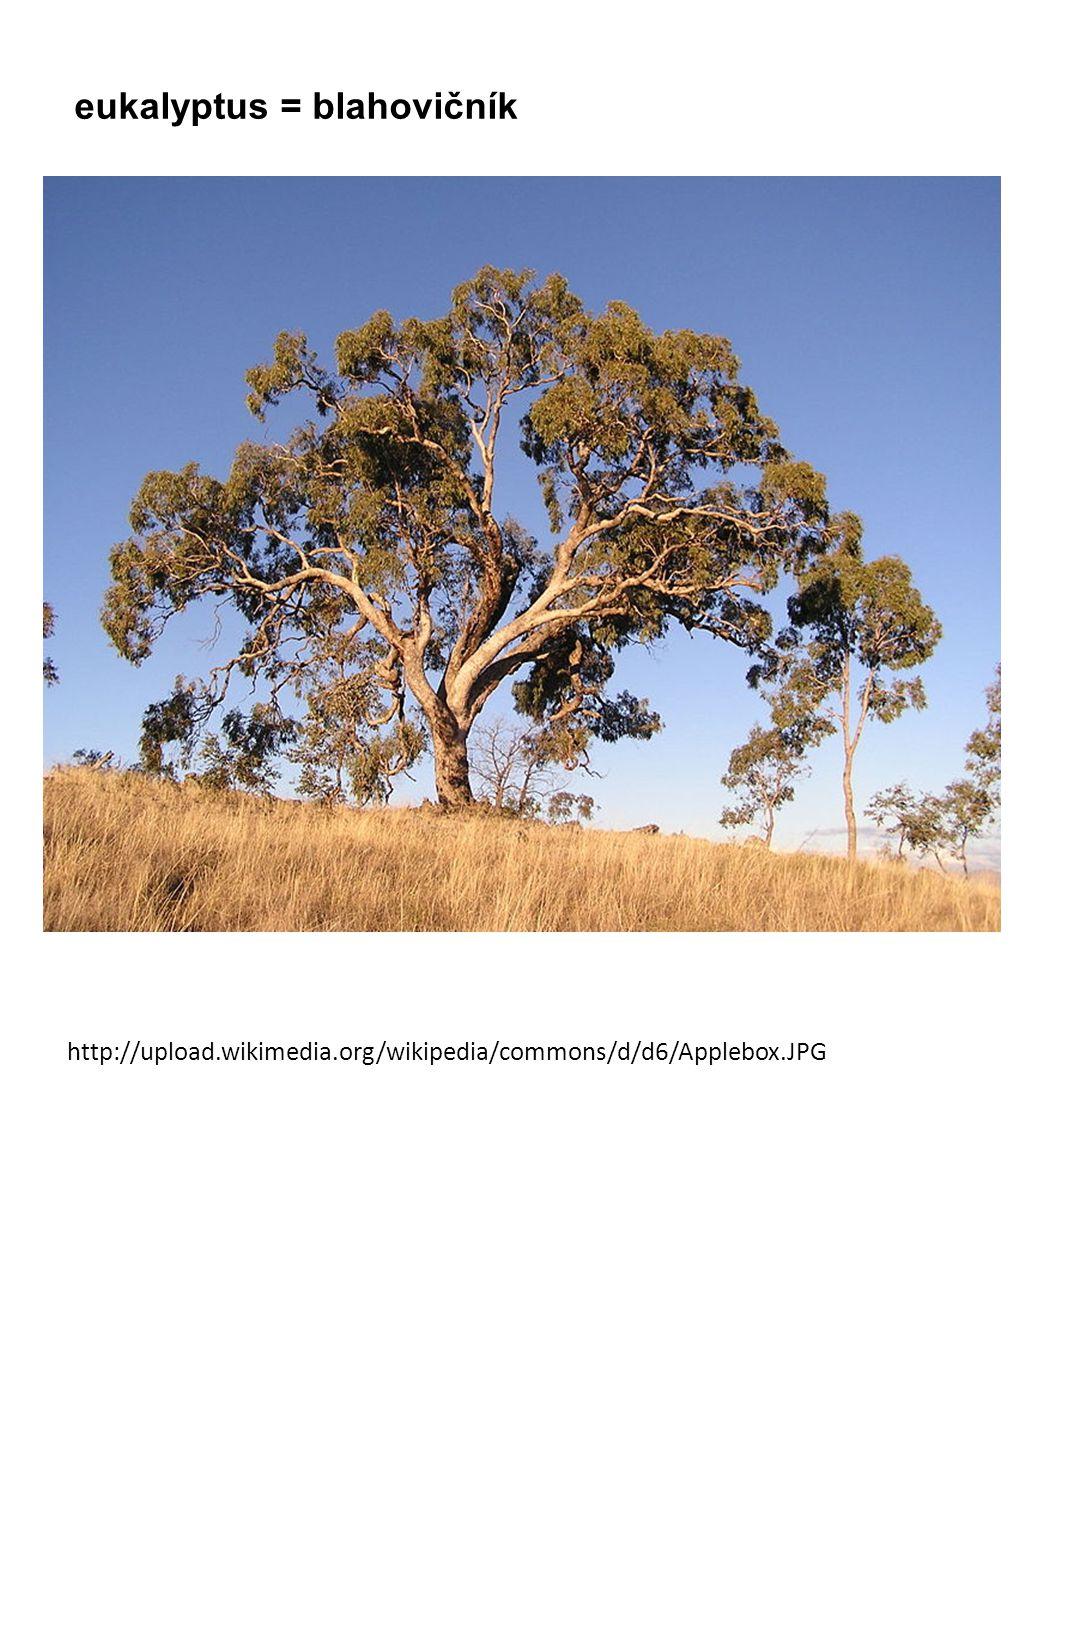 eukalyptus = blahovičník http://upload.wikimedia.org/wikipedia/commons/d/d6/Applebox.JPG